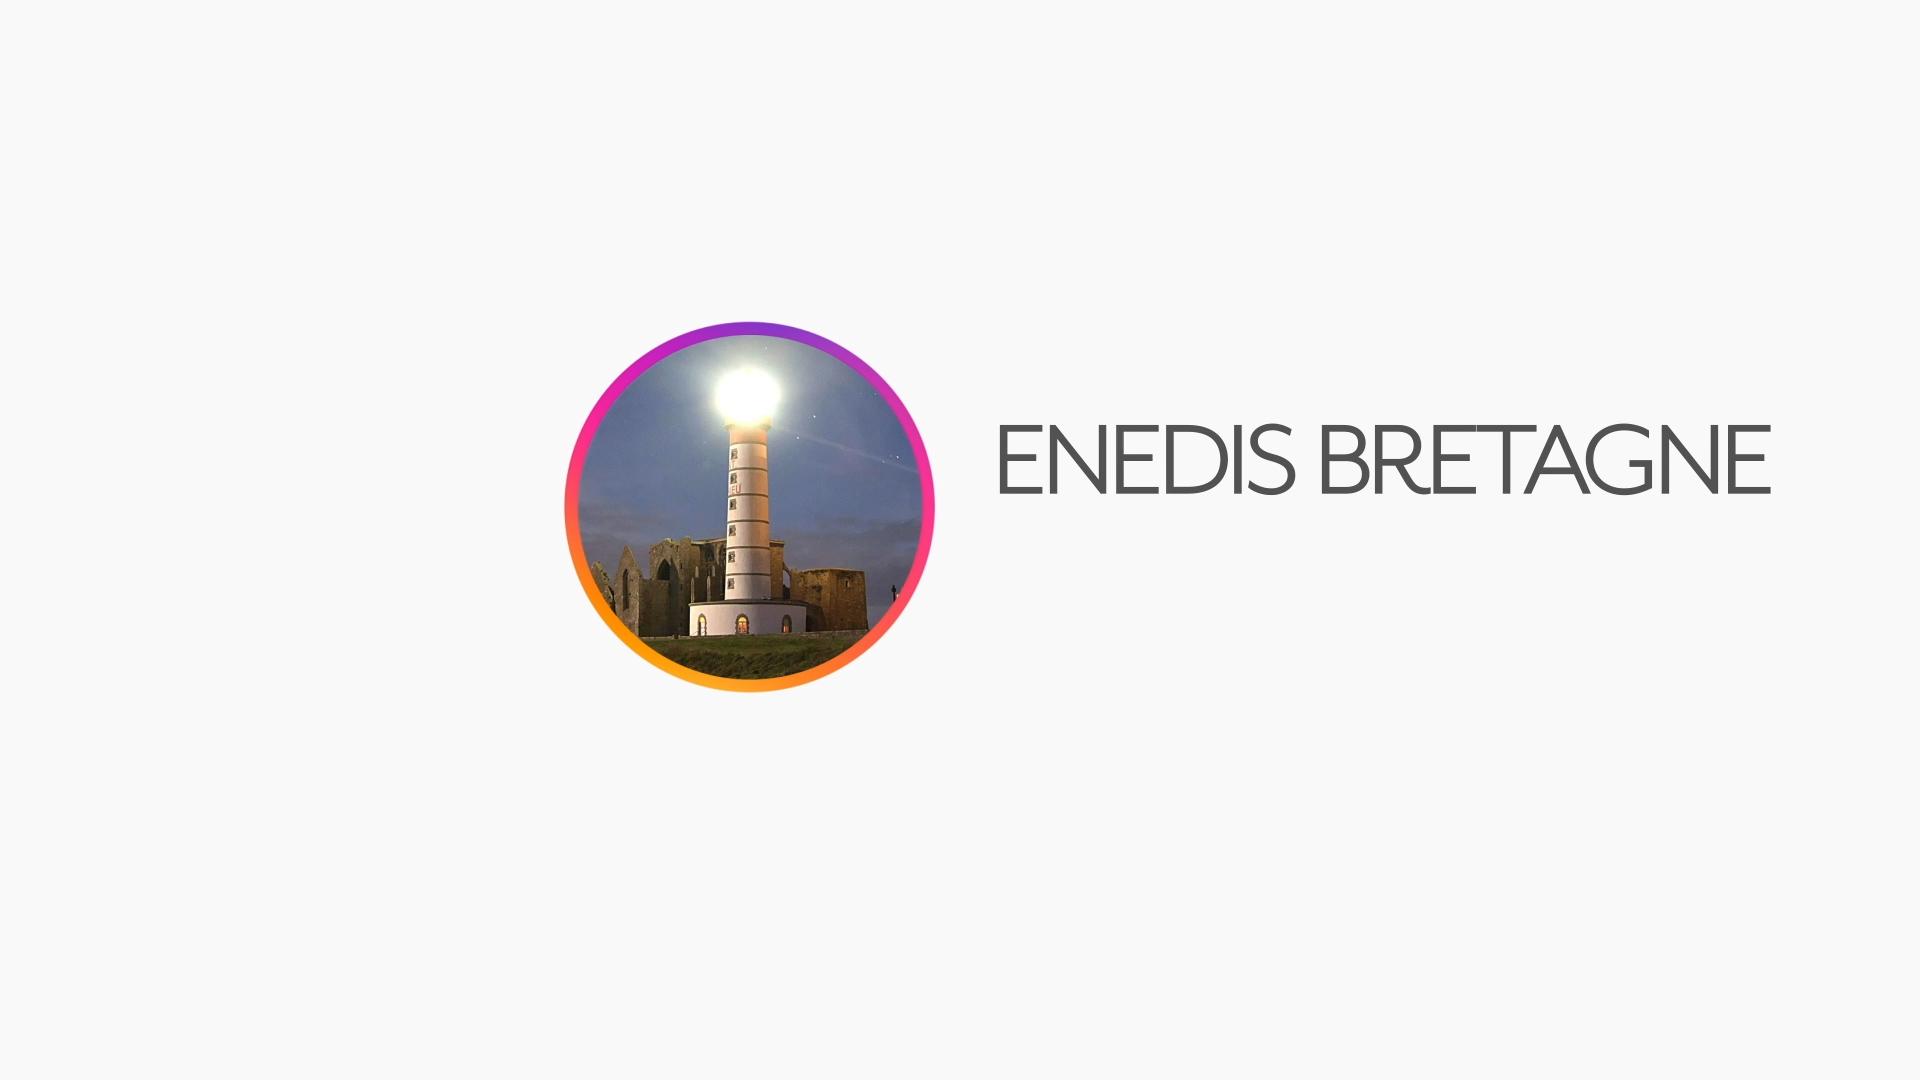 Enedis Bretagne